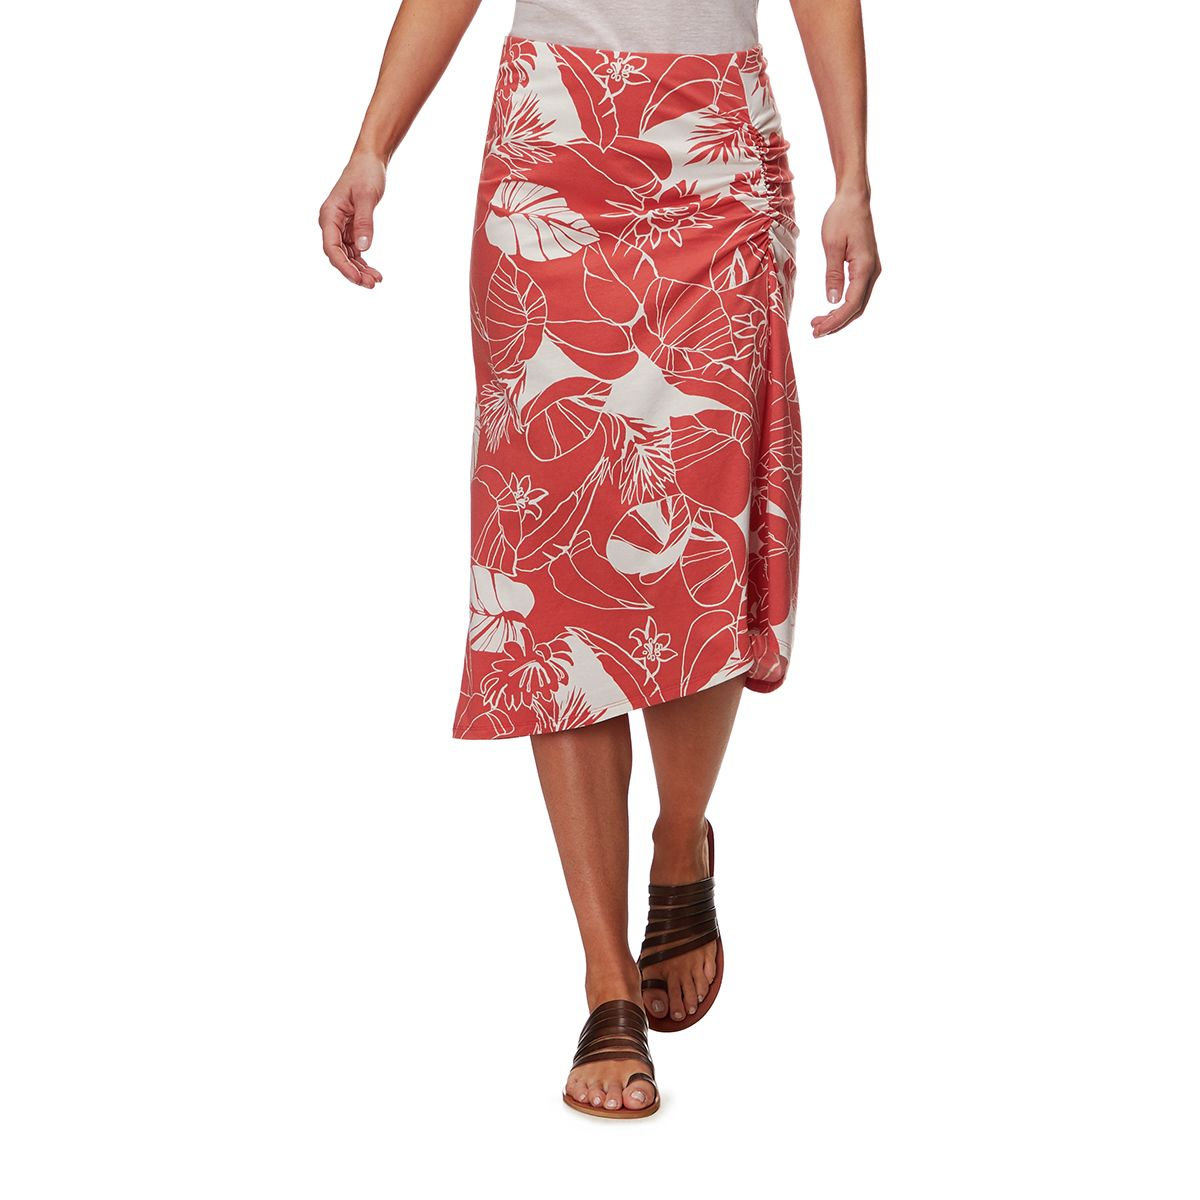 Patagonia Dream Song Skirt - Women's Valley Flora/Quartz Coral, L PAT02B1-VALFLOCOR-L